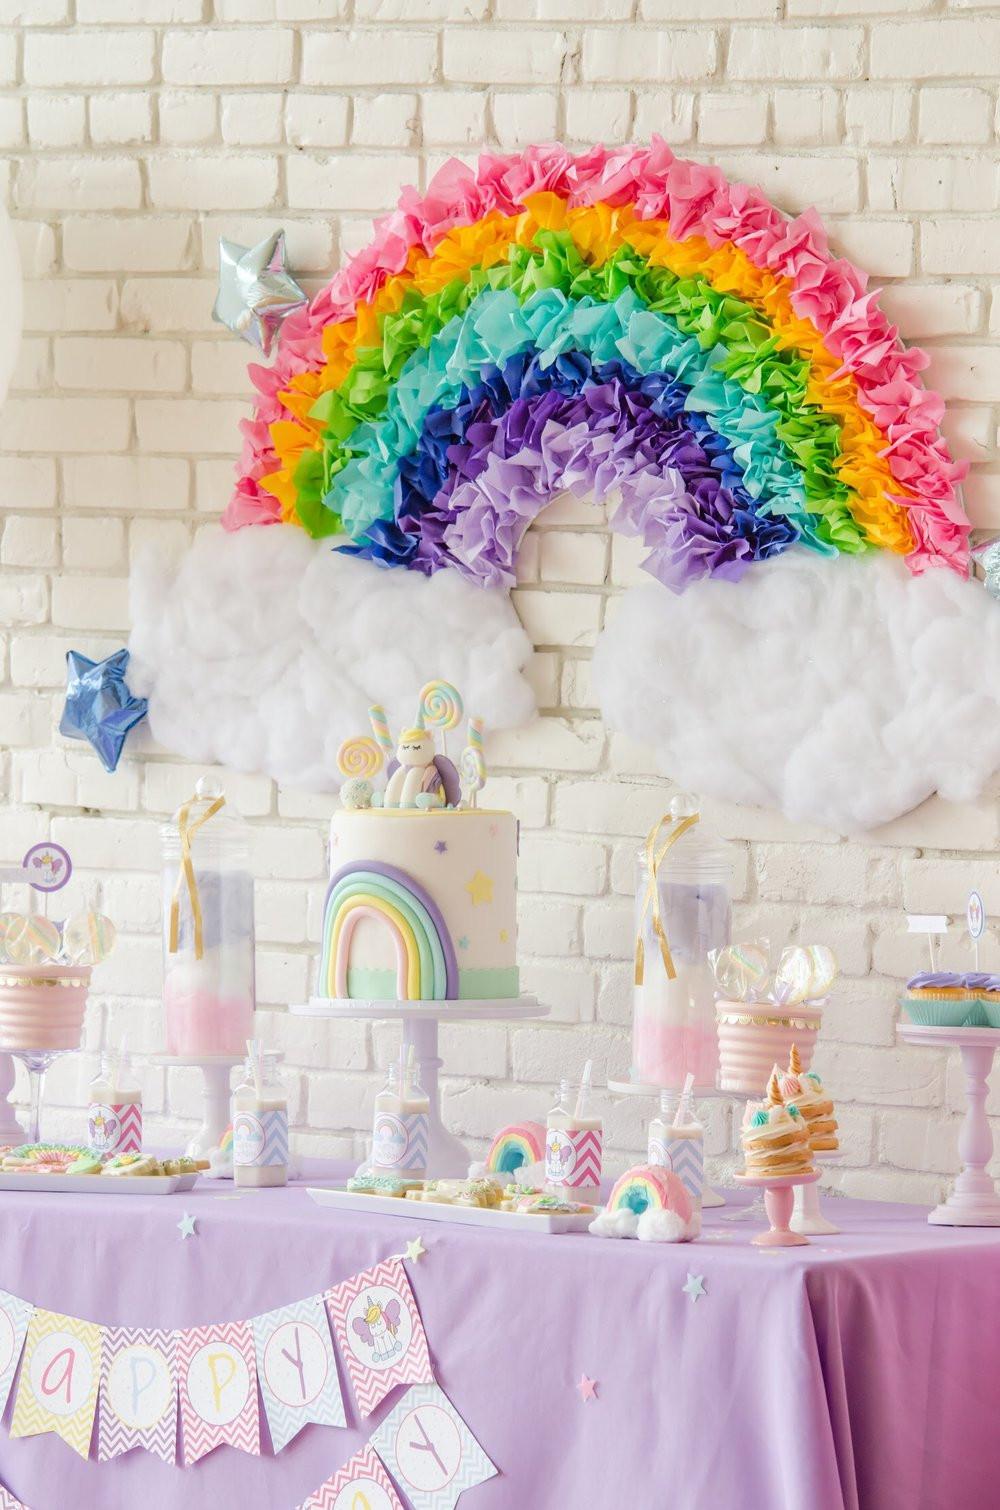 Diy Unicorn Birthday Party Ideas  The Sweetest Unicorn Birthday Party Free Printables